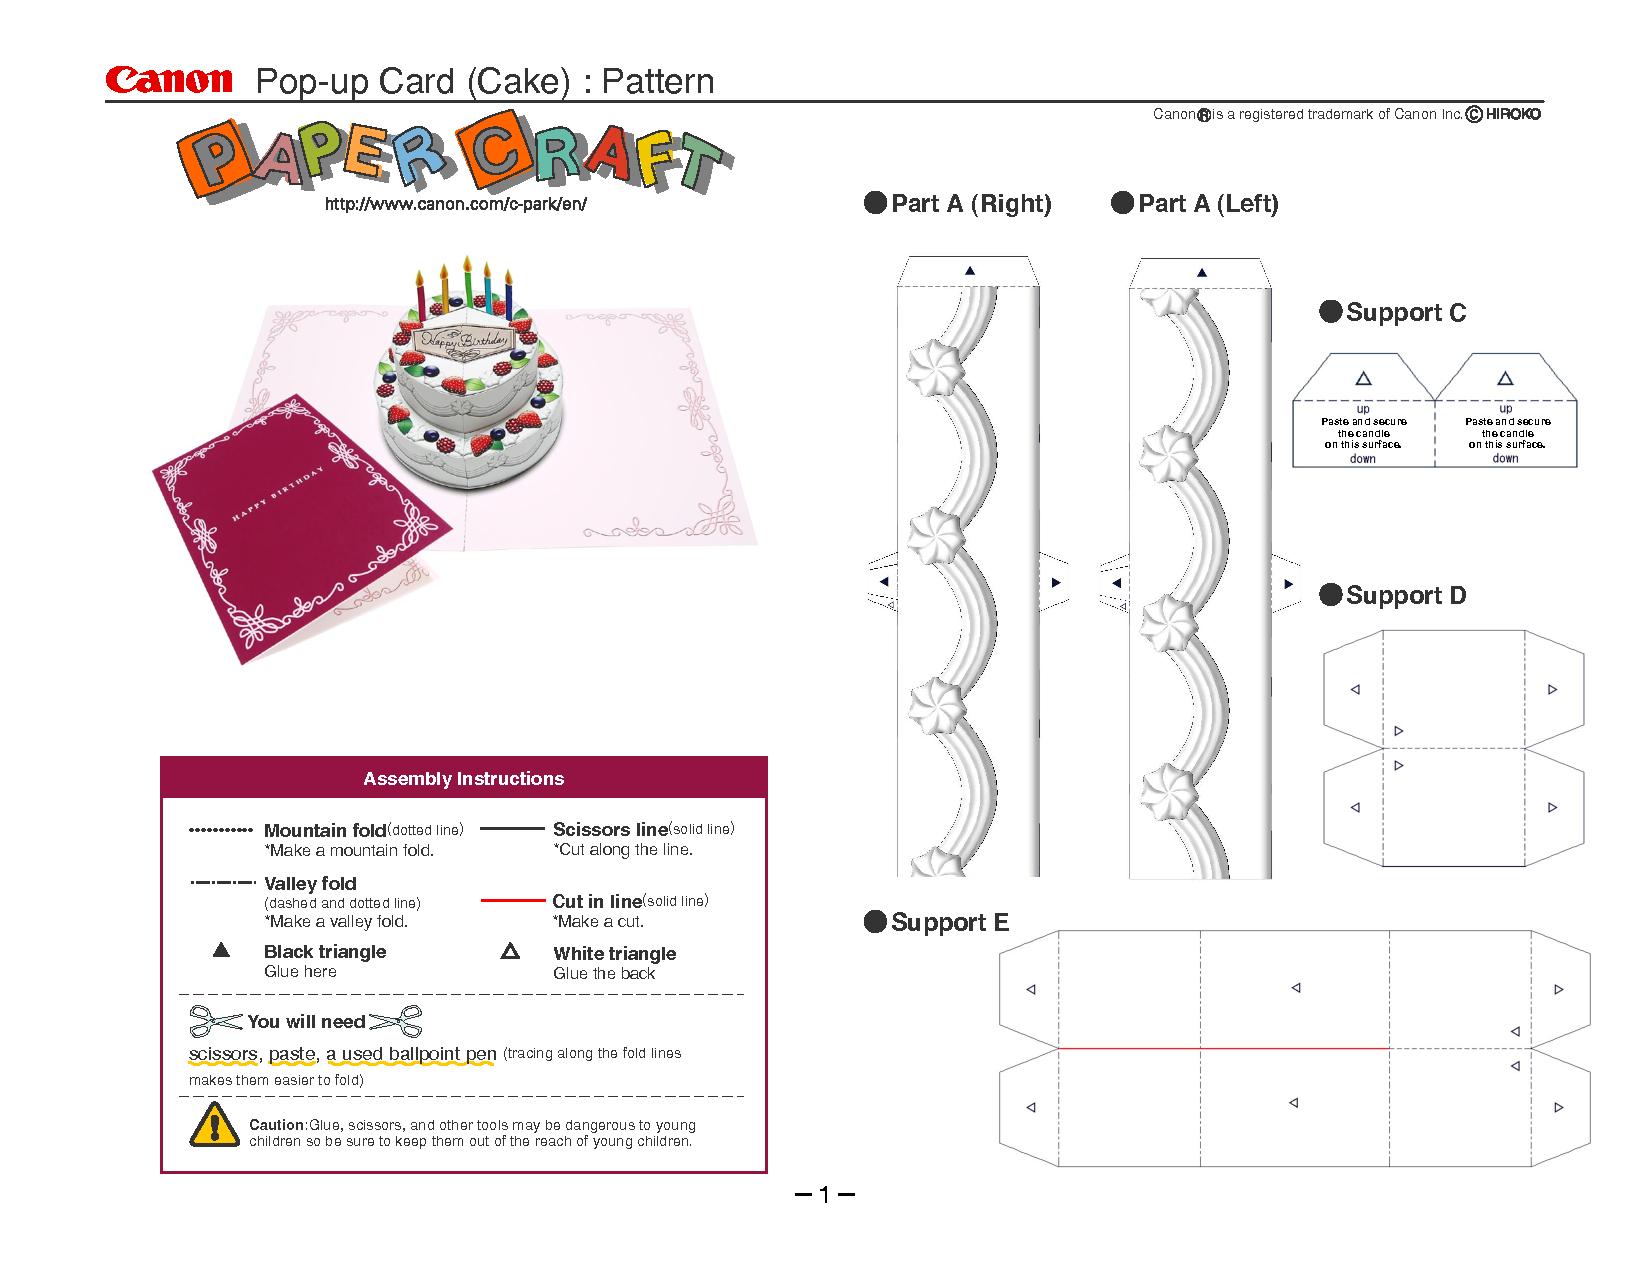 Birthday Cake Pop-Up Card Template   Cards   Pop Up Card Templates - Free Printable Birthday Pop Up Card Templates